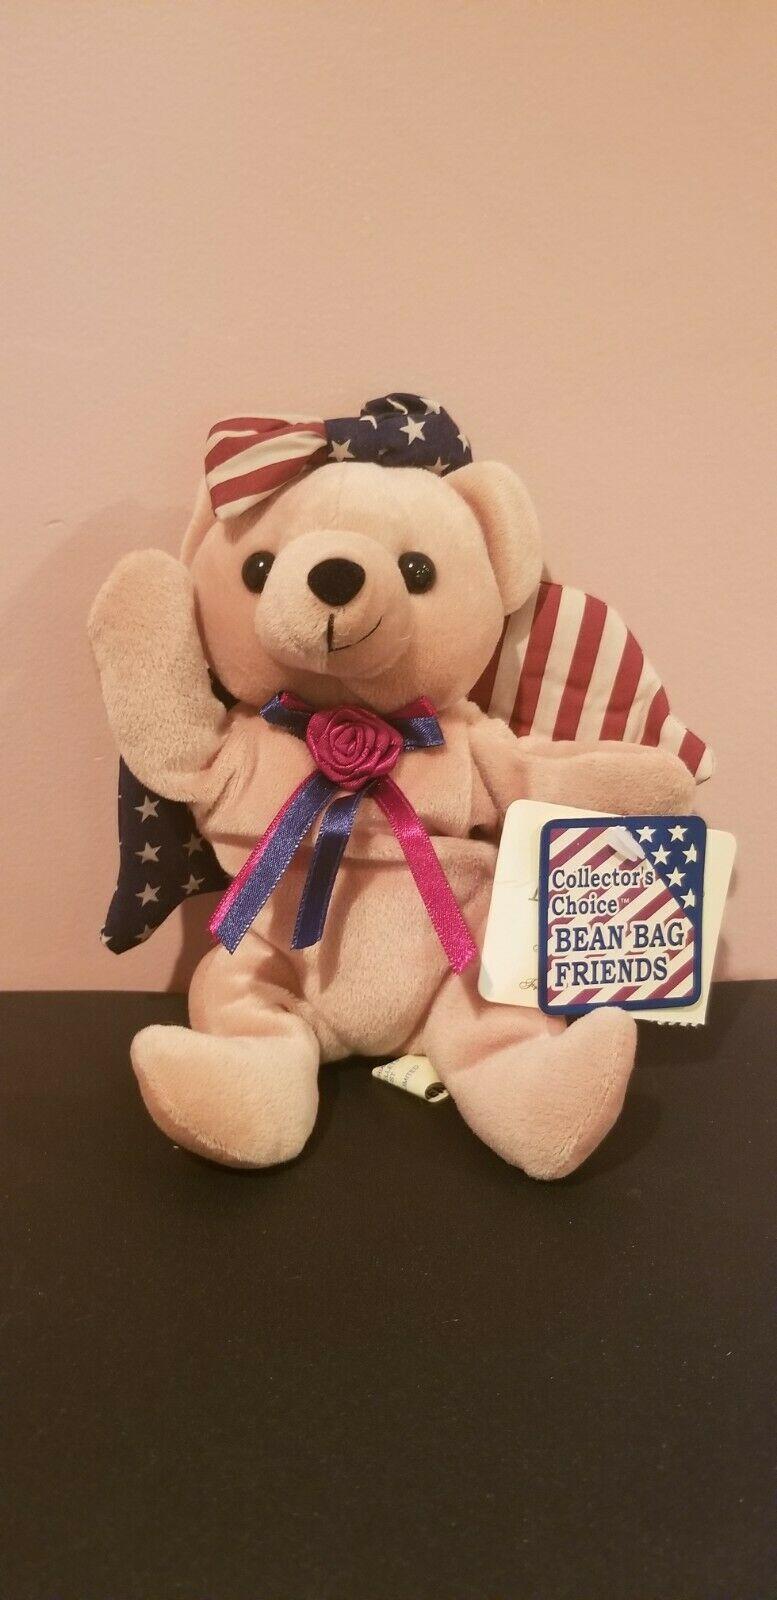 Stars & Stripes America Themed Collector's Choice Bean Bag Friend - $7.79